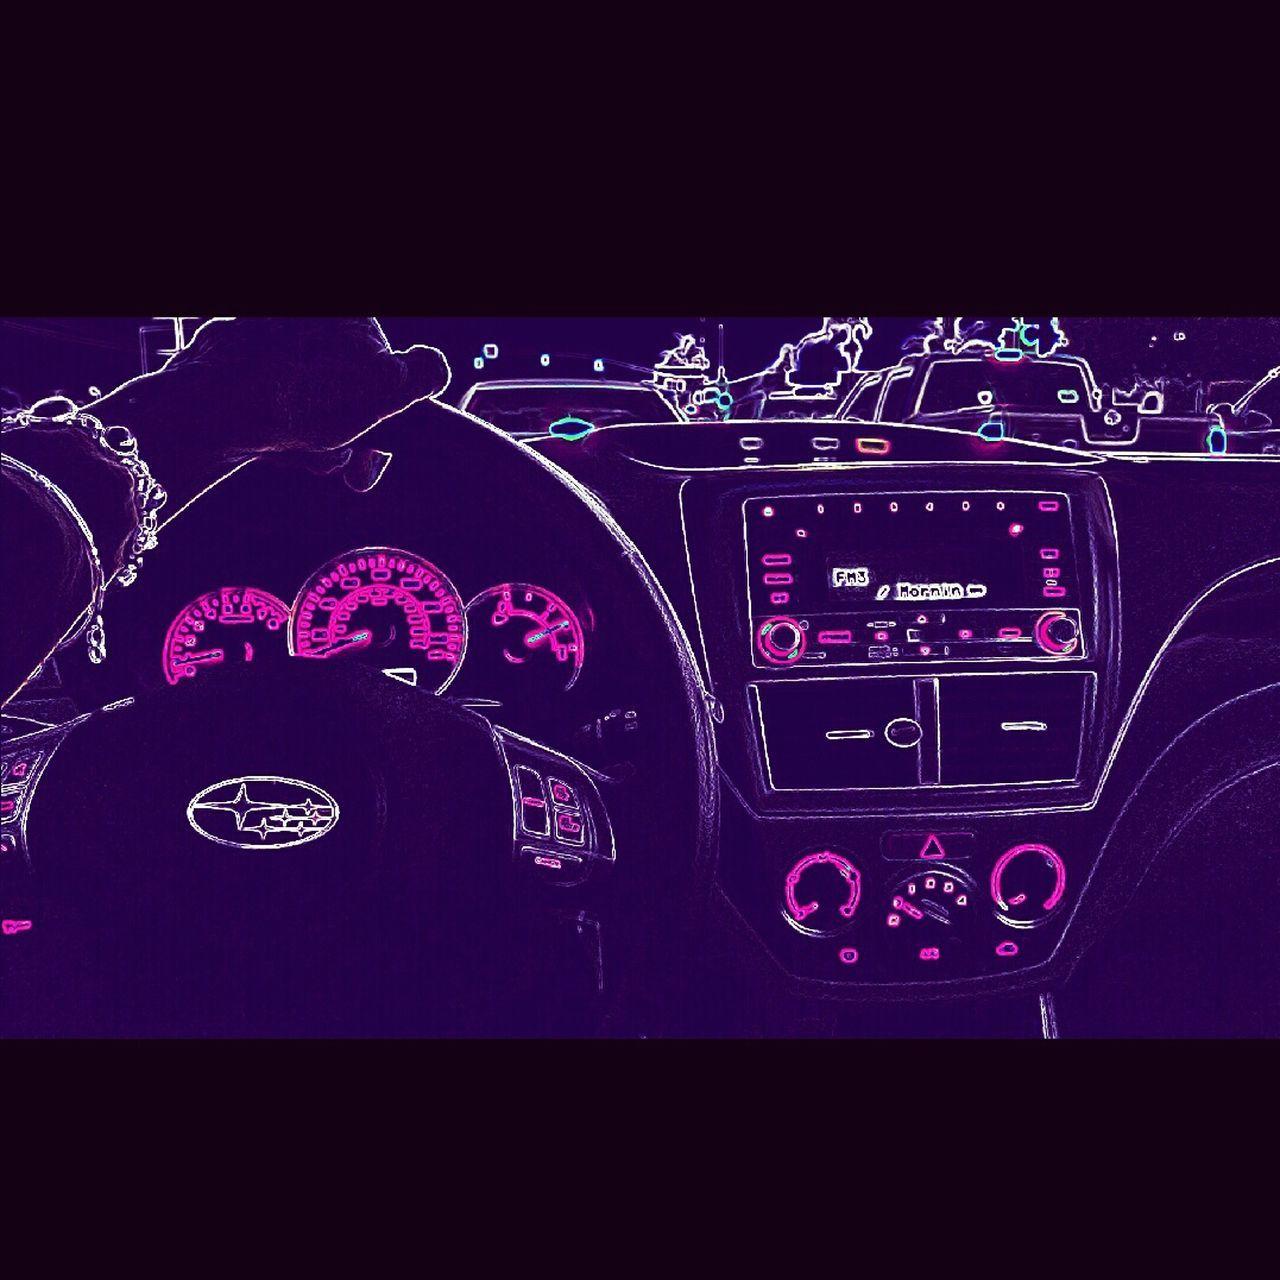 SO in love with my new ride ♡? Life It's What Makes Subaru A Subaru Wheels He Loves Me, He Really Loves Me Drive Roadtrip Warrior California Nevada Arizona Utah Colorado and back ❗❗